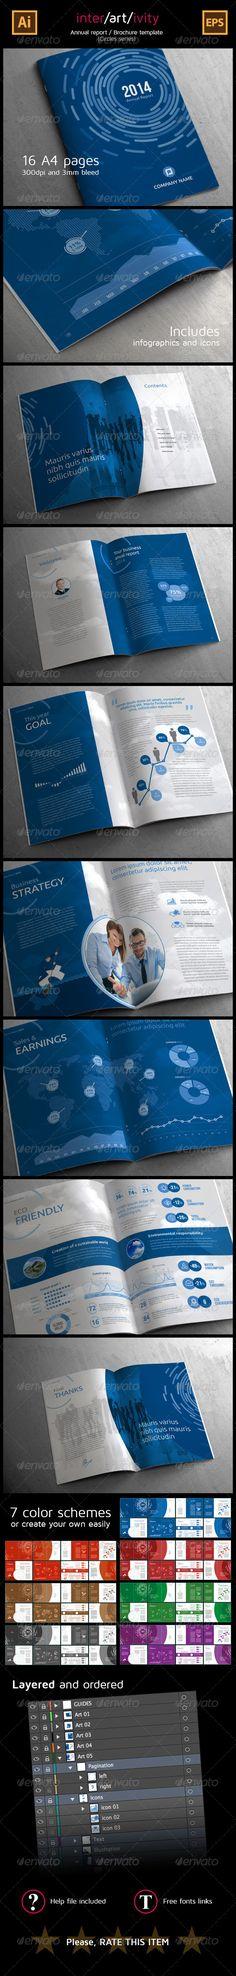 Corporate Annual Report (Circles Series) - Corporate Brochures